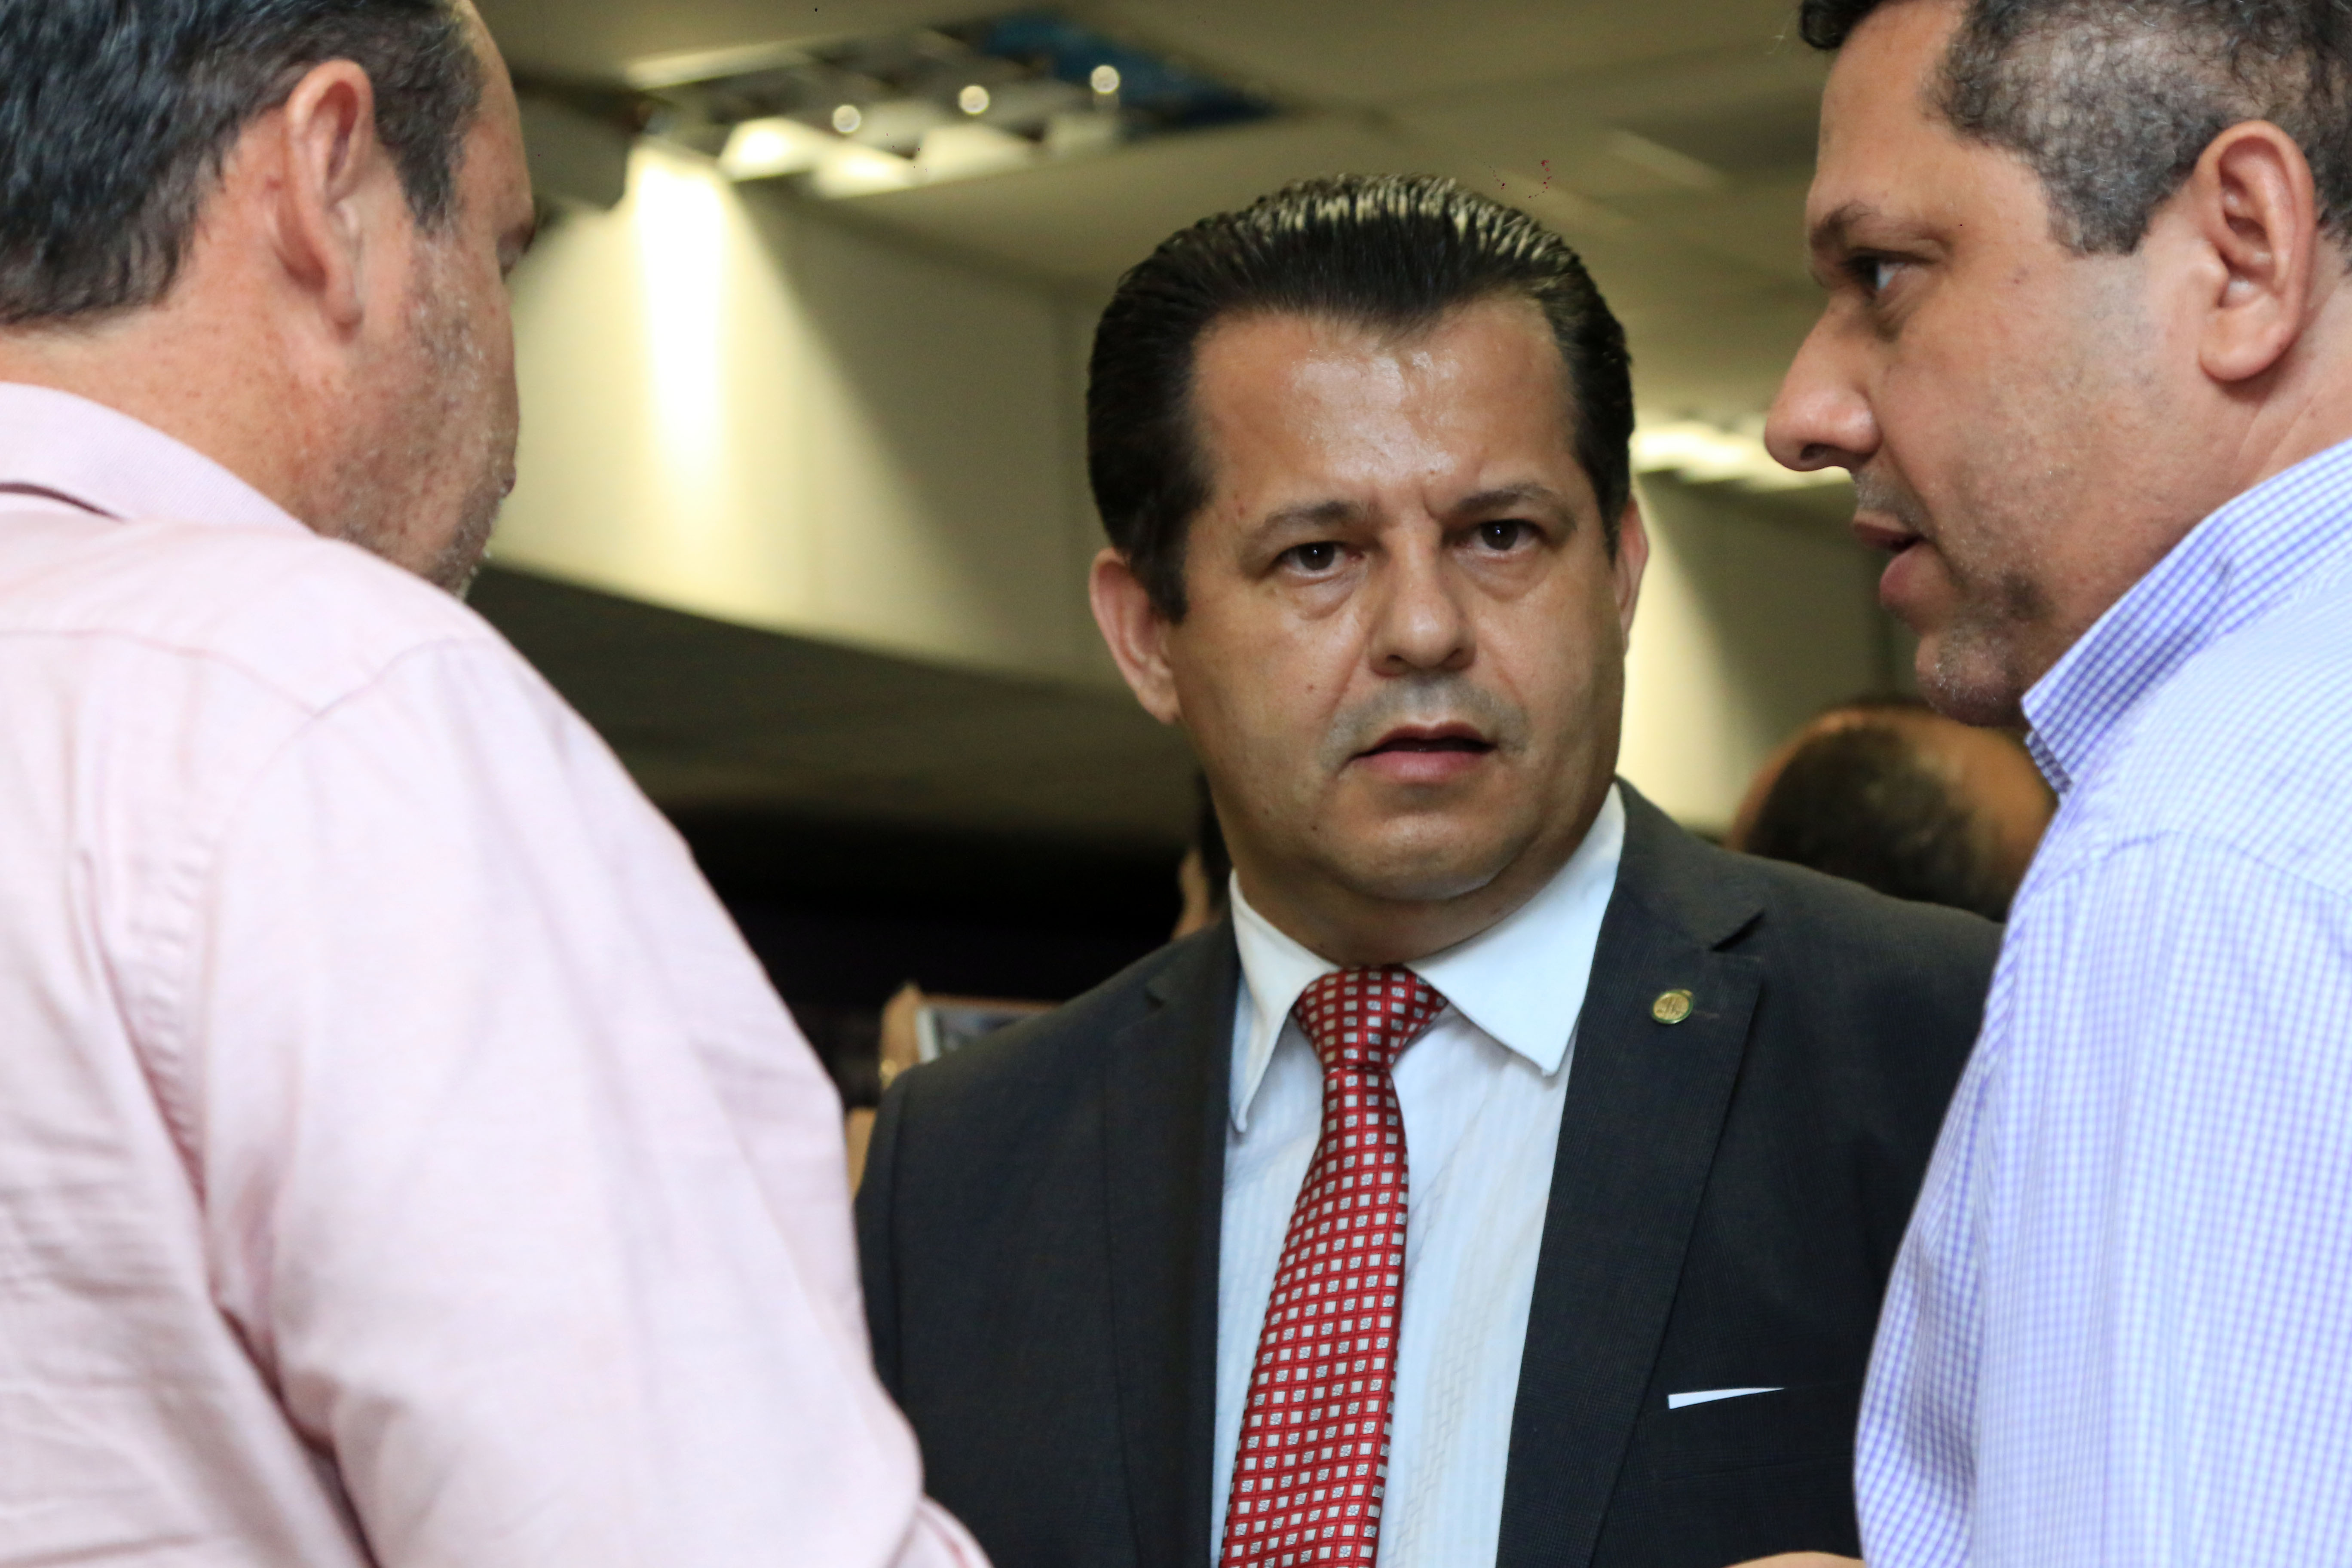 Deputado VALTENIR PEREIRA